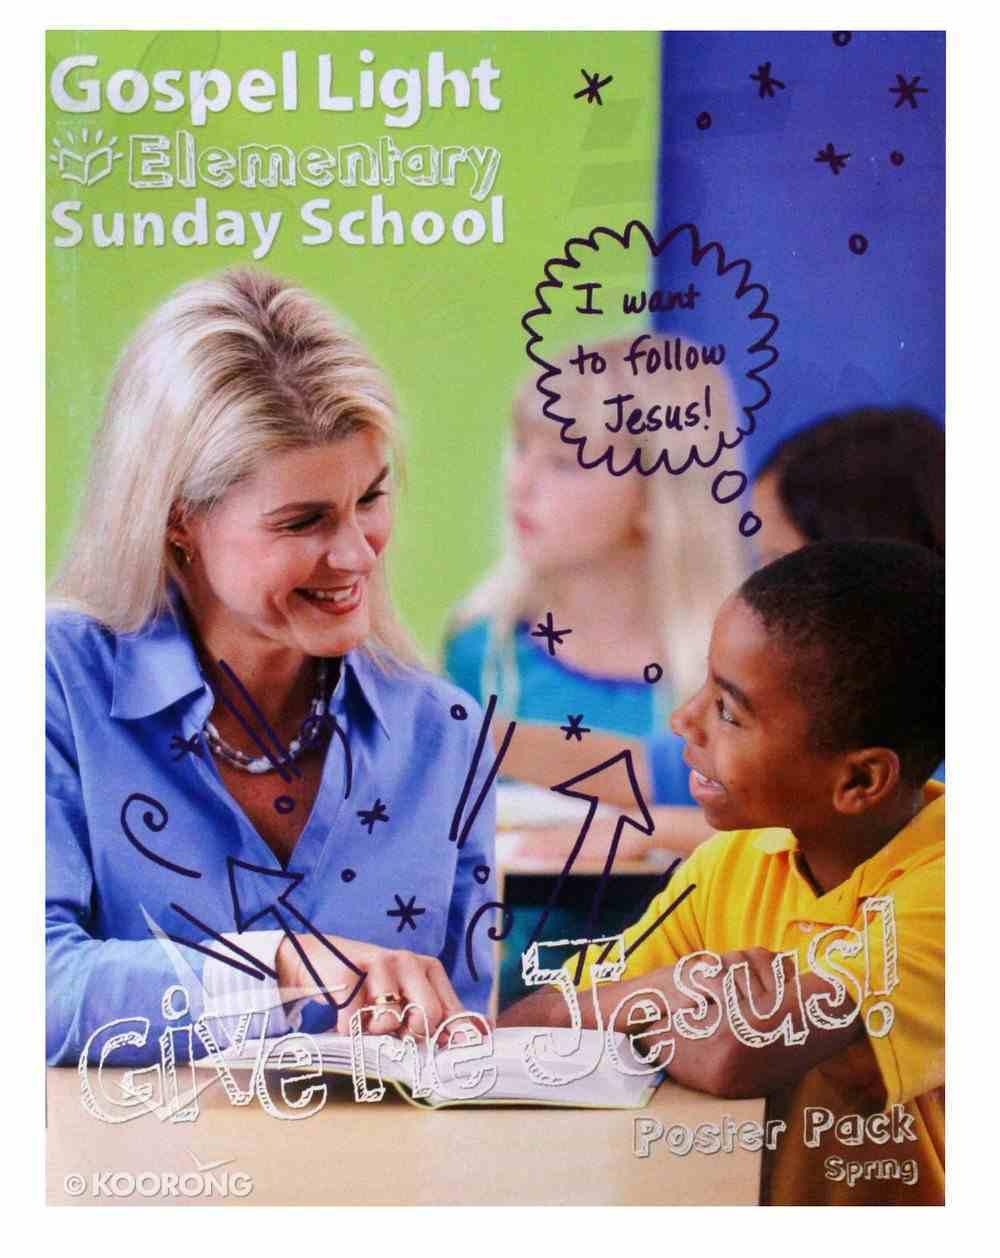 Spring a 2020 Grades 1 & 2 Poster Pack (Gospel Light Living Word Series) Poster